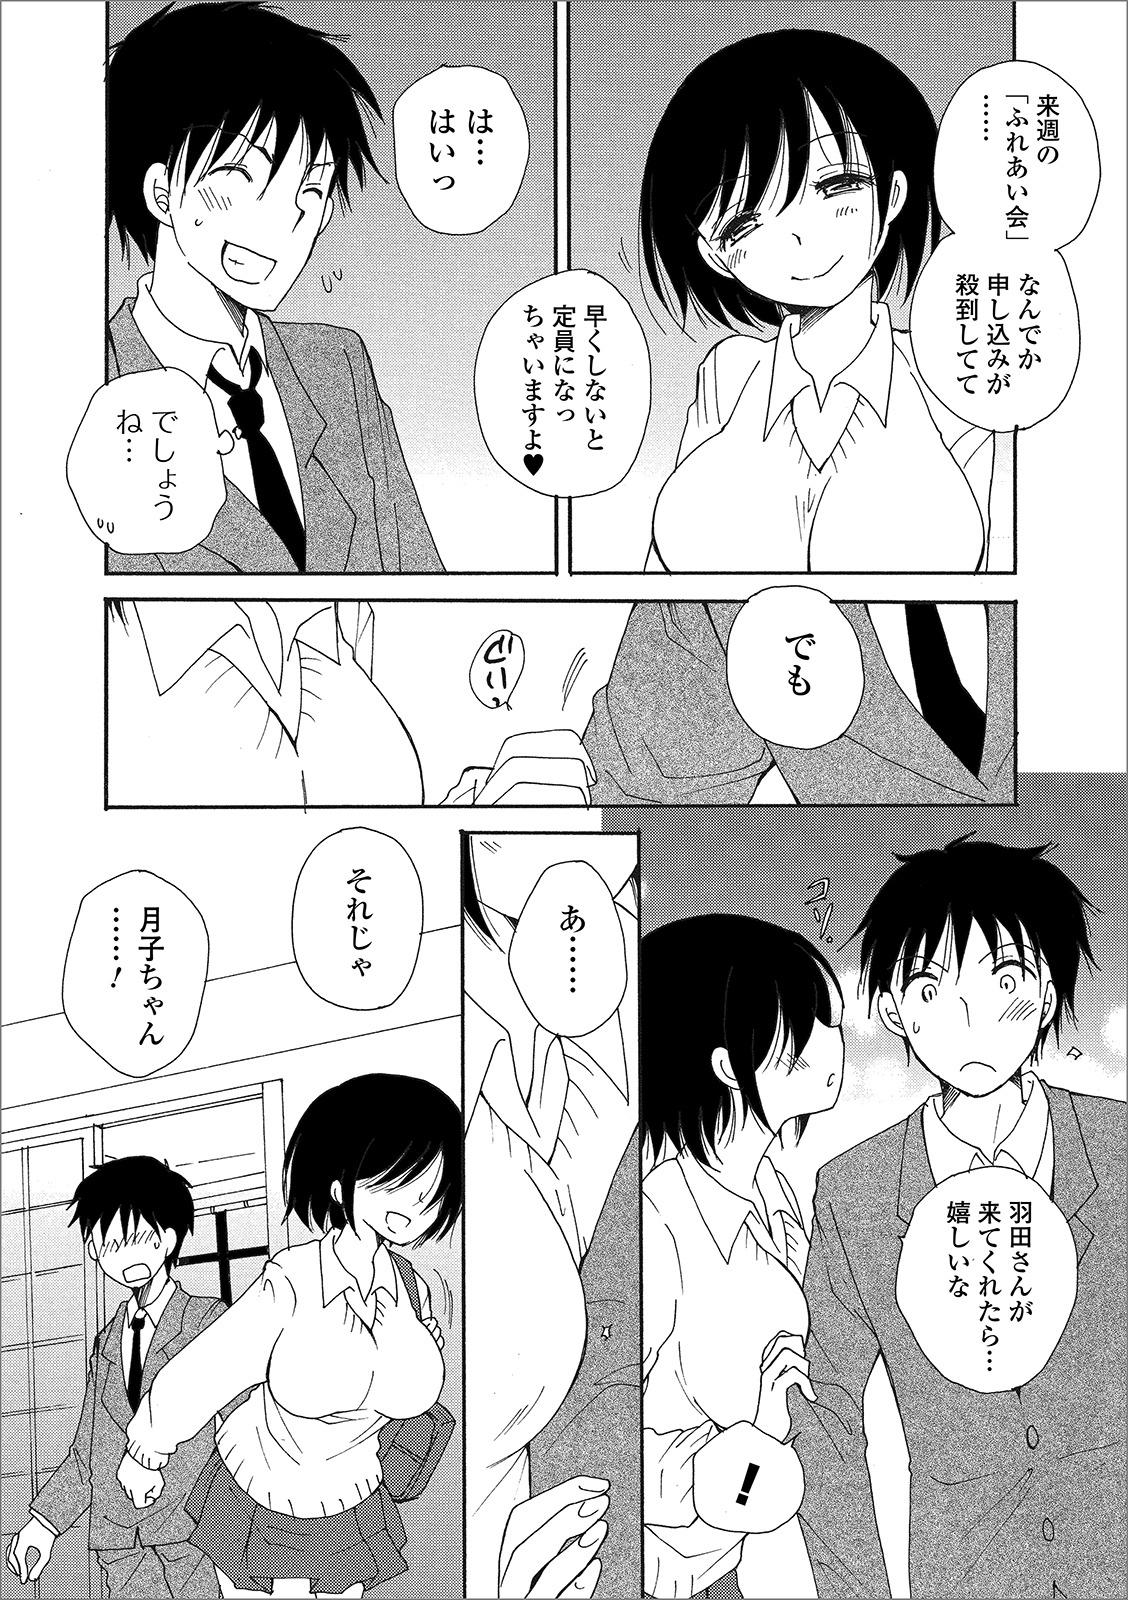 COMIC Shigekiteki SQUIRT!! Vol. 15 190